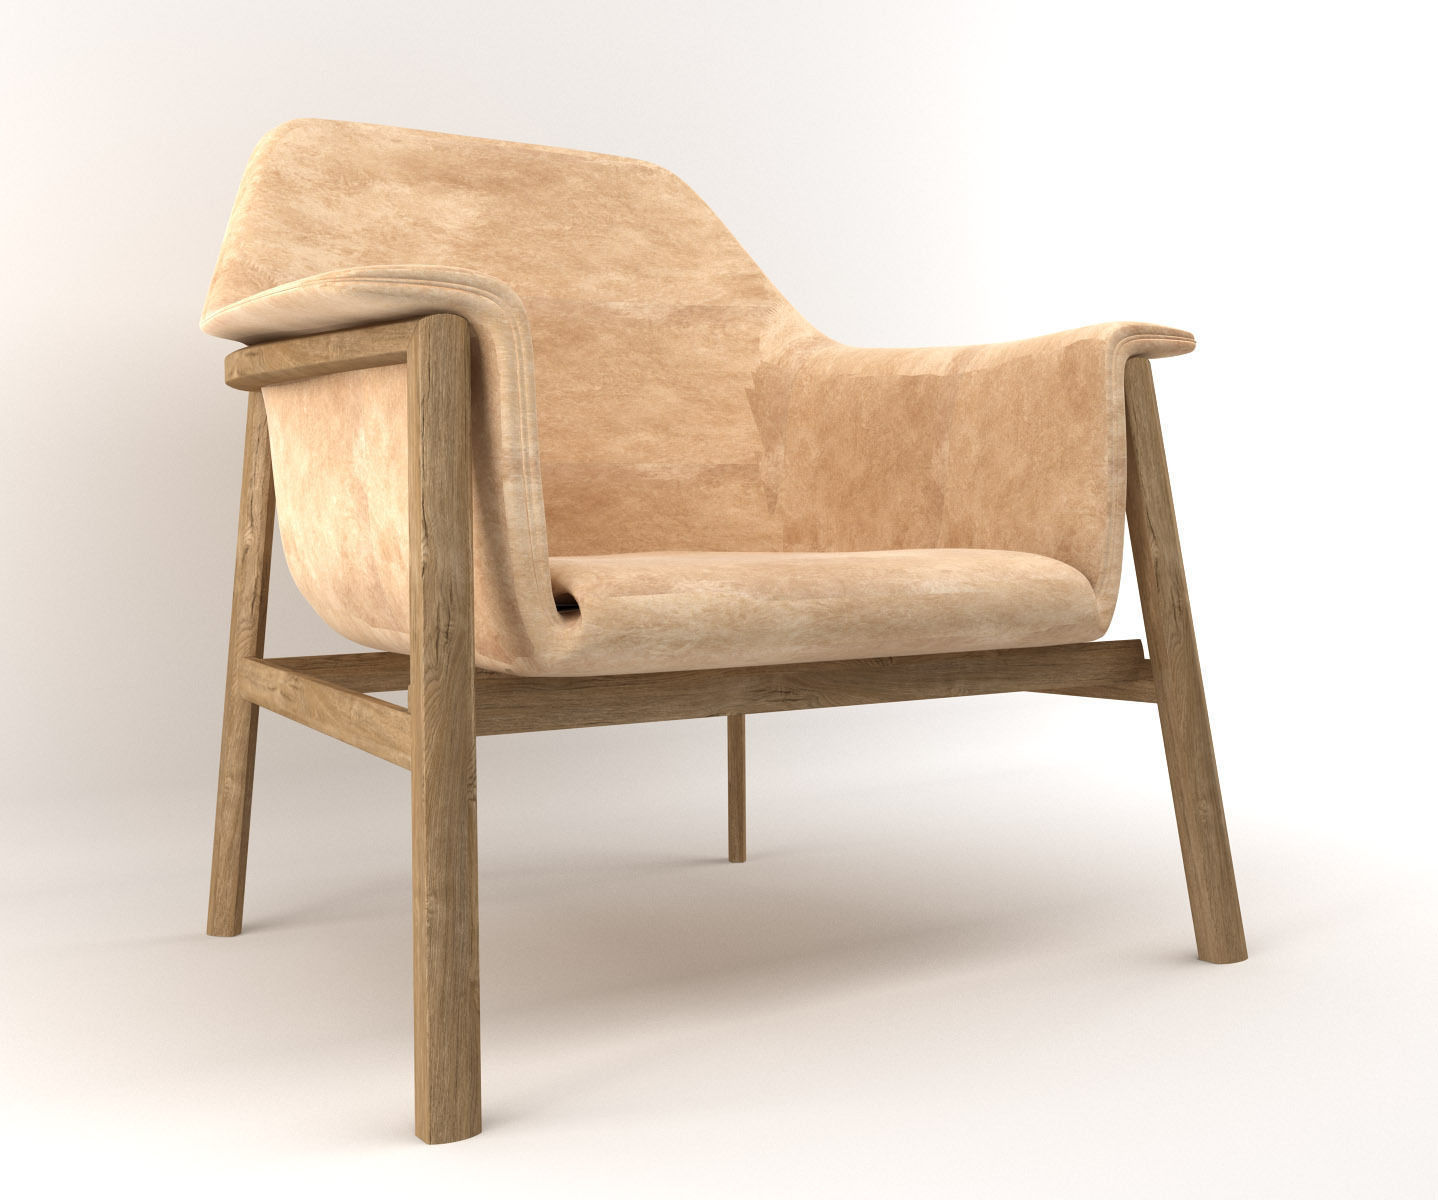 Wooden Armchair 3d Model Max Obj 3dm